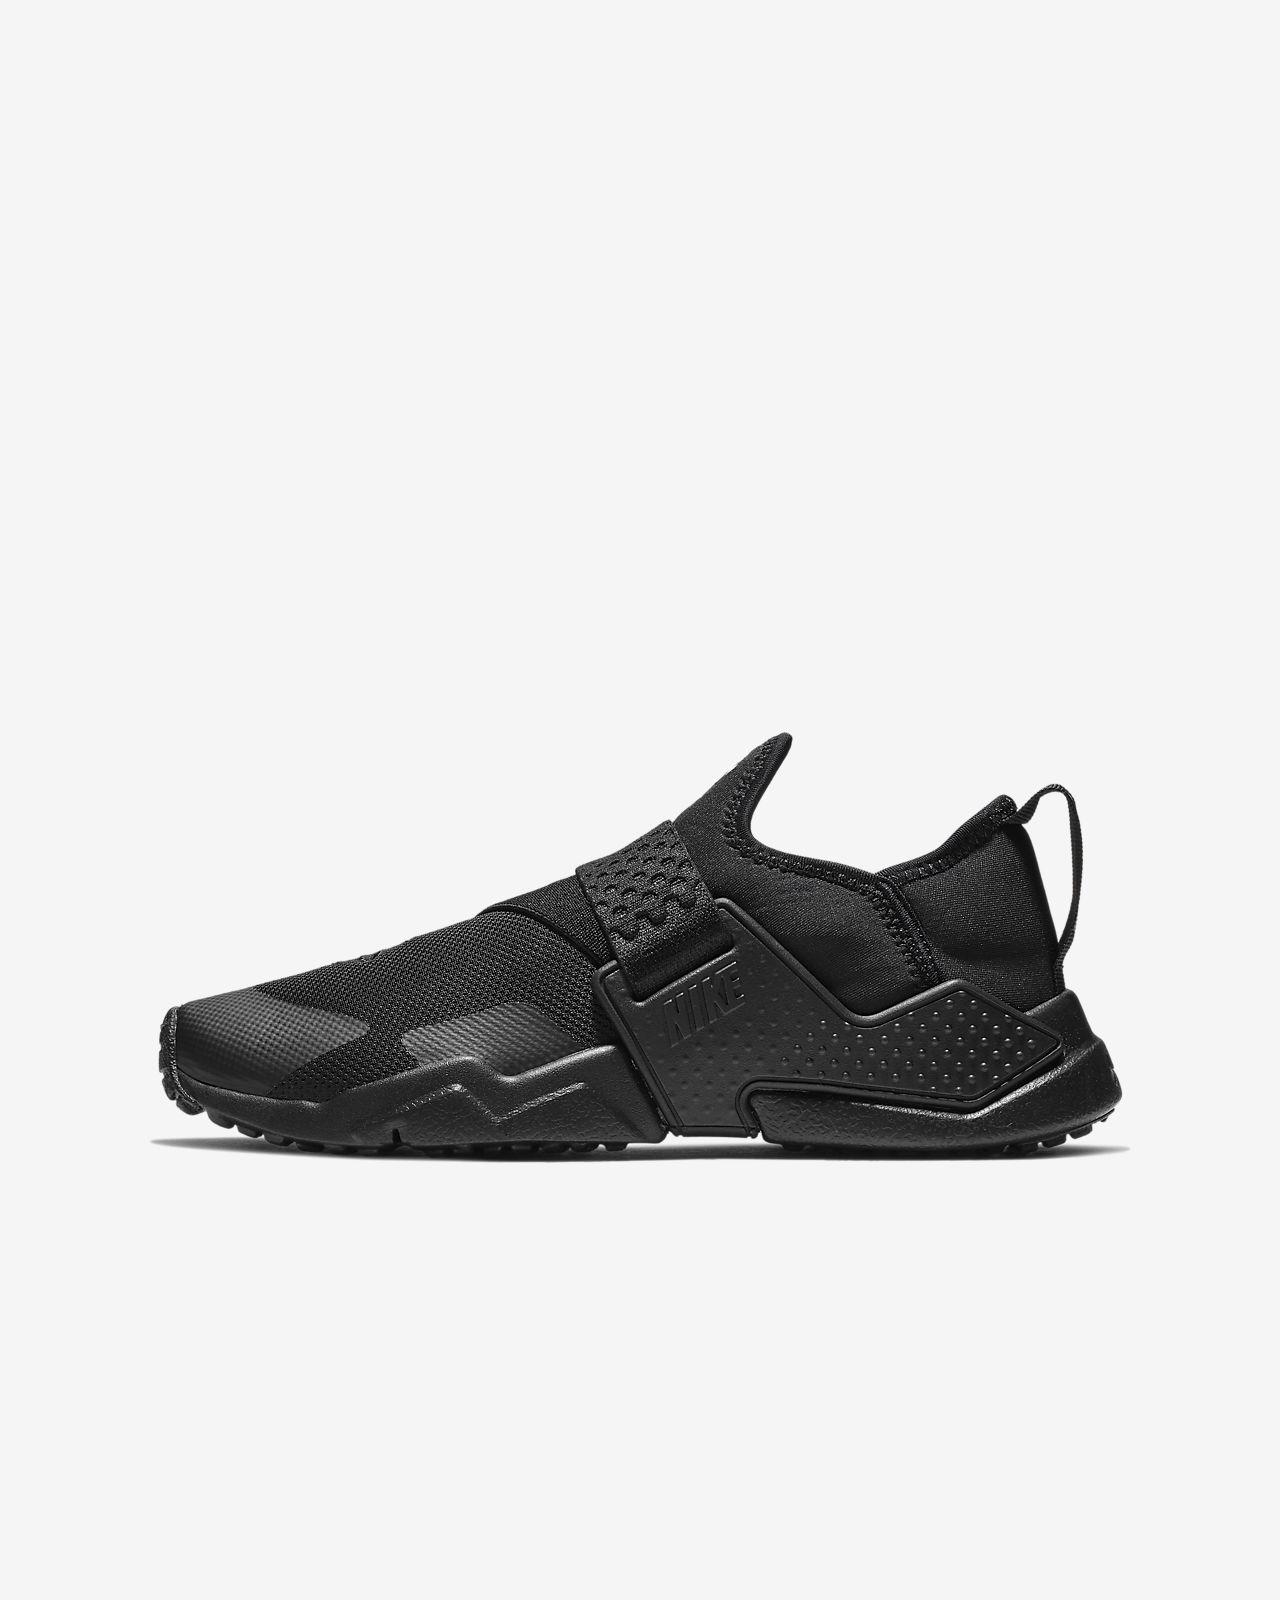 c78dd96f0e764 Nike Huarache Extreme Big Kids  Shoe. Nike.com